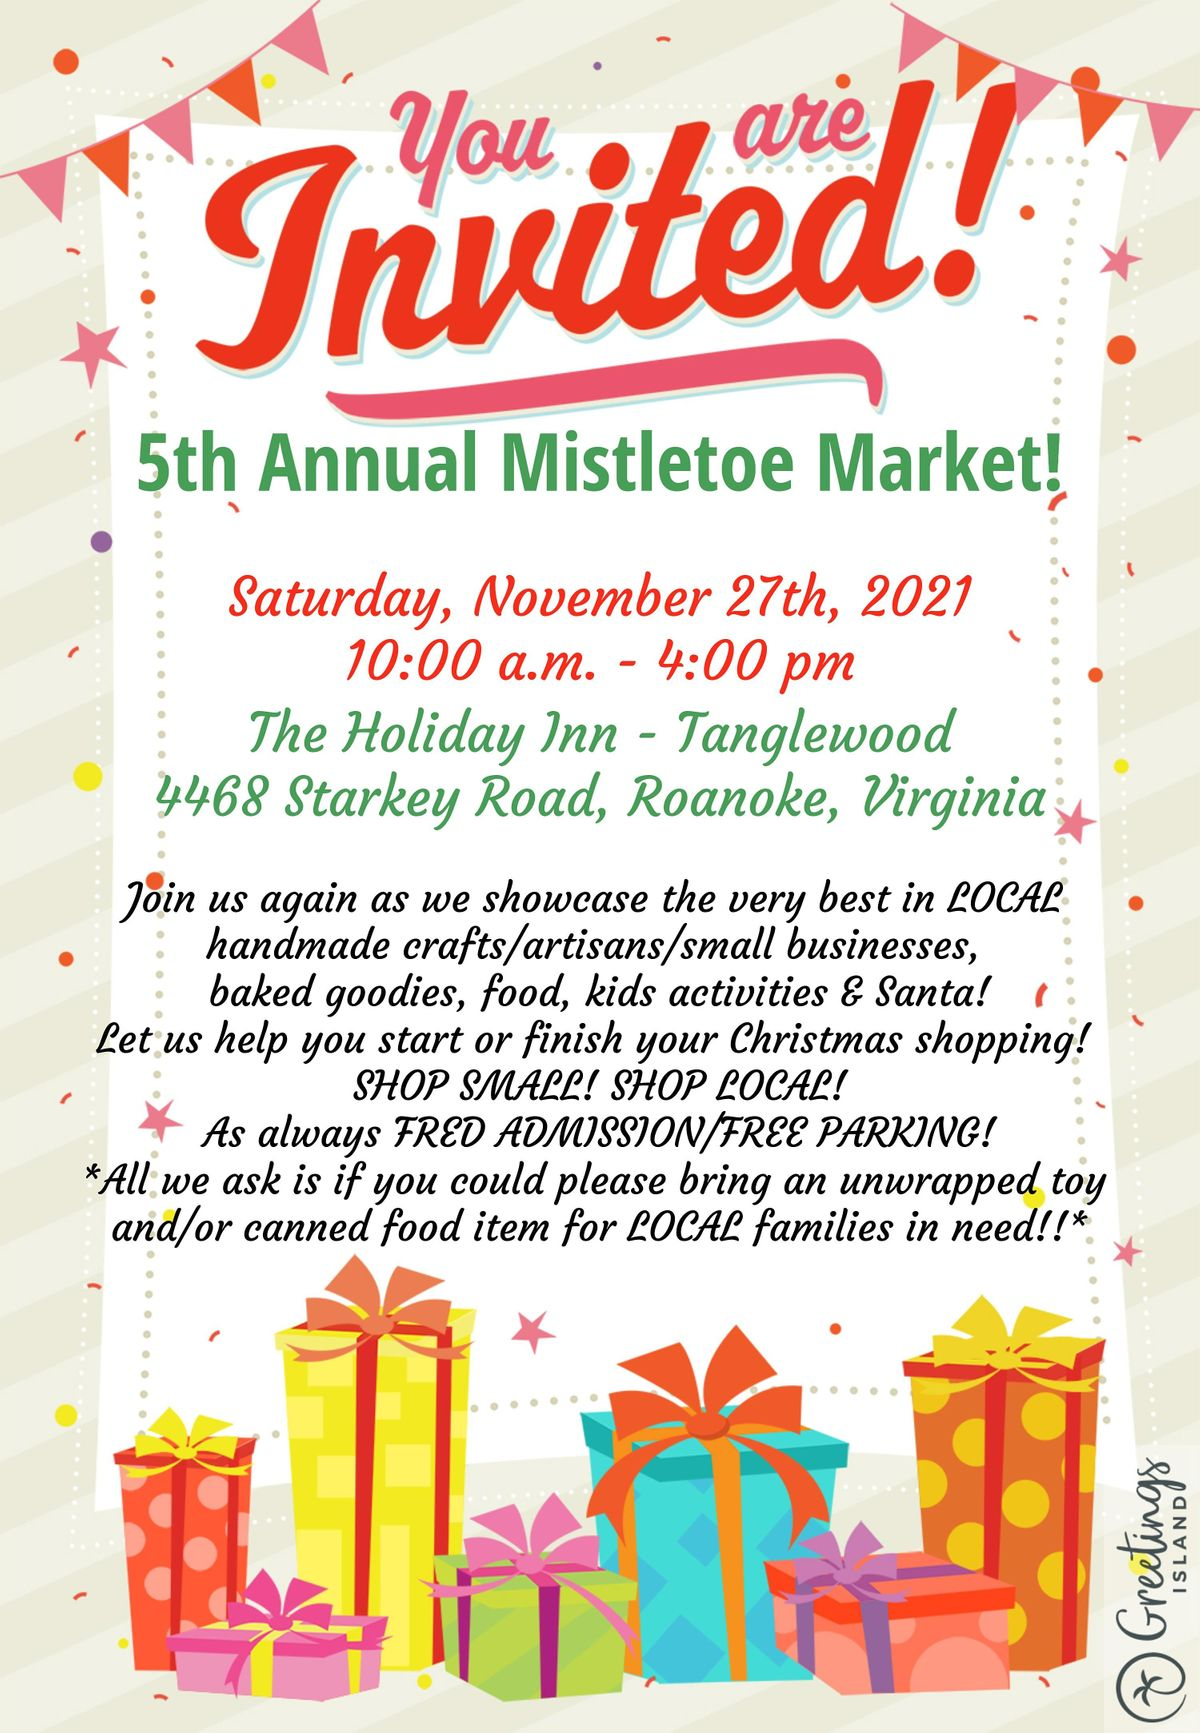 Christmas Markets Virginia 2021 5th Annual Mistletoe Market 4468 Starkey Rd Cave Spring November 27 2021 Allevents In